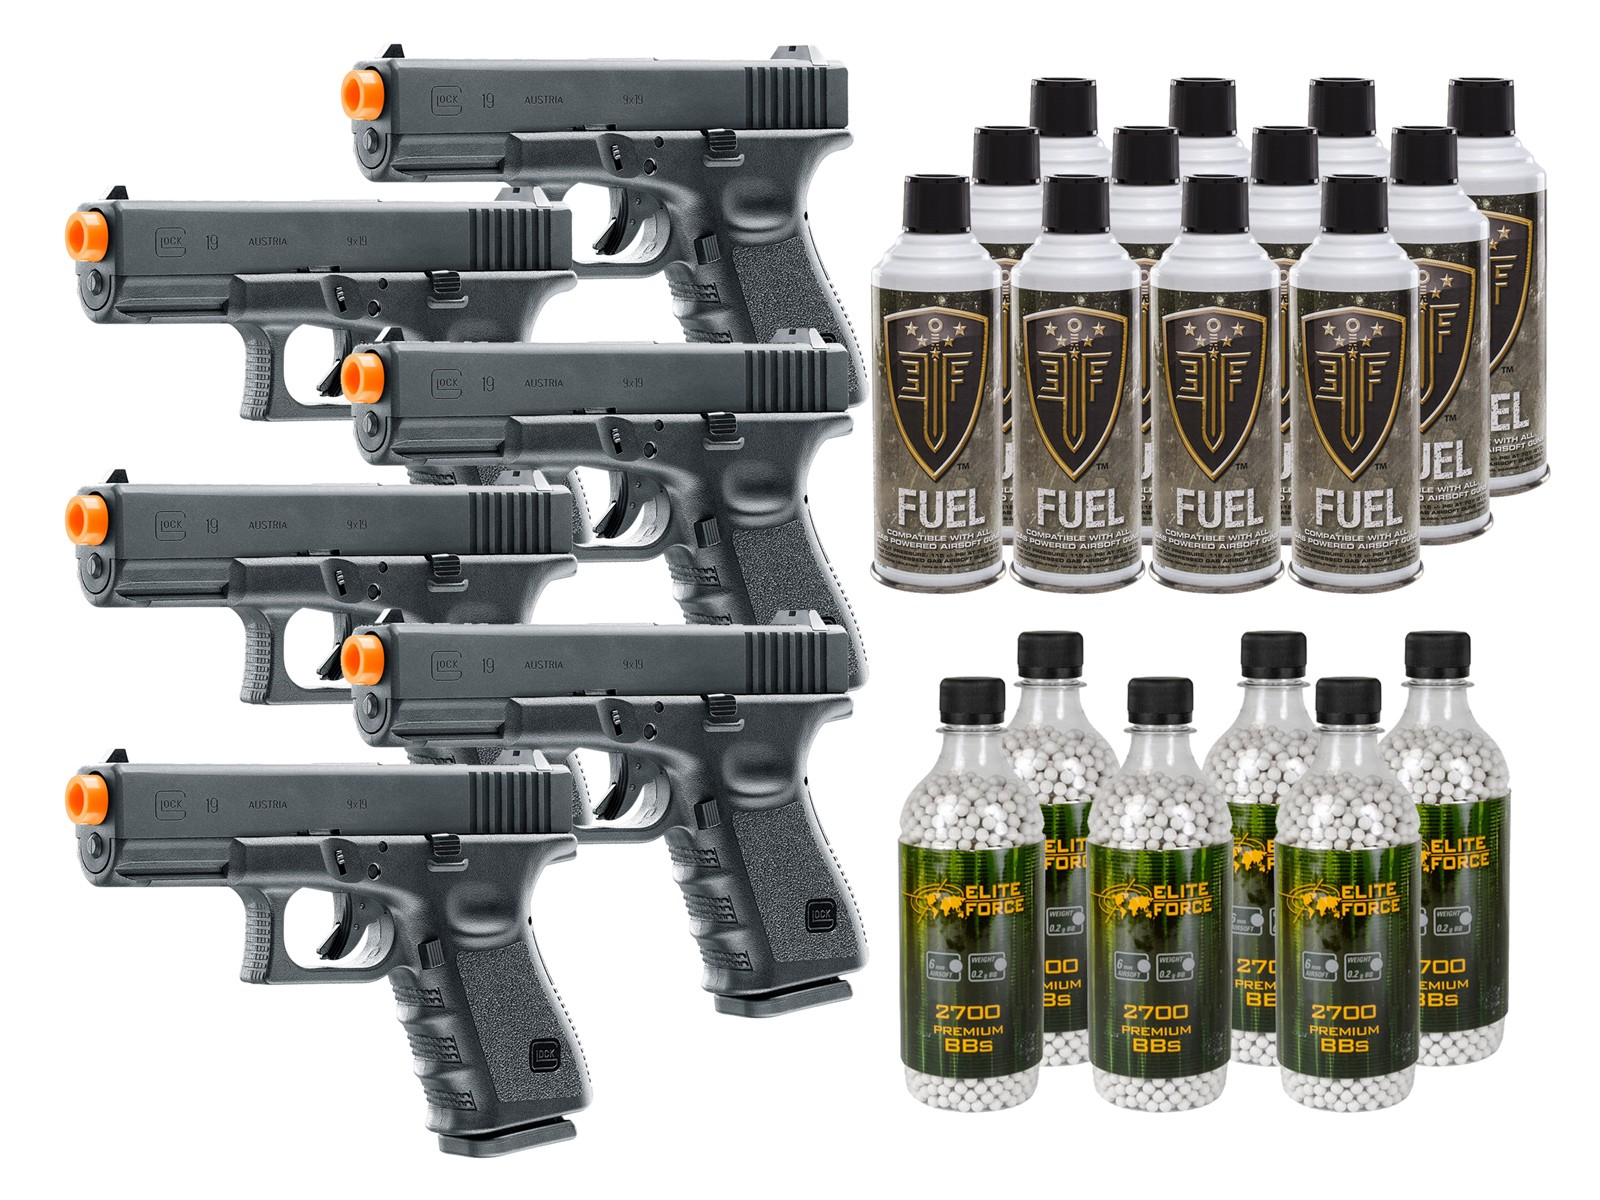 Umarex_Glock_19_GBB_Airsoft_Pistol_Kit_Incl_6_Pistols_6mm